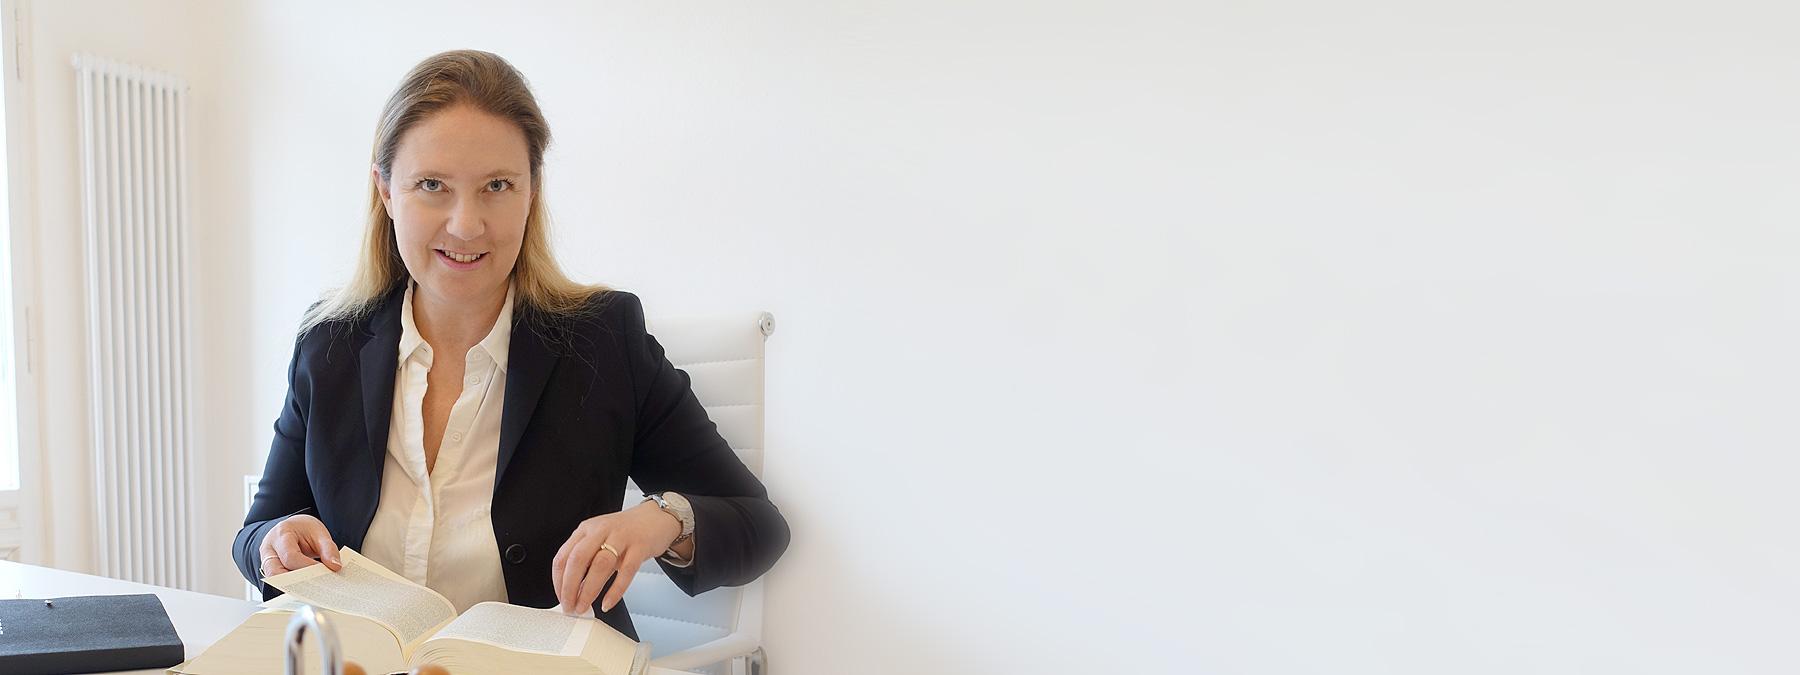 Anwalt Anwältin Potsdam Anwaltskanzlei Versicherung Sozialversicherung Pflegeversicherungen Krankenversicherung